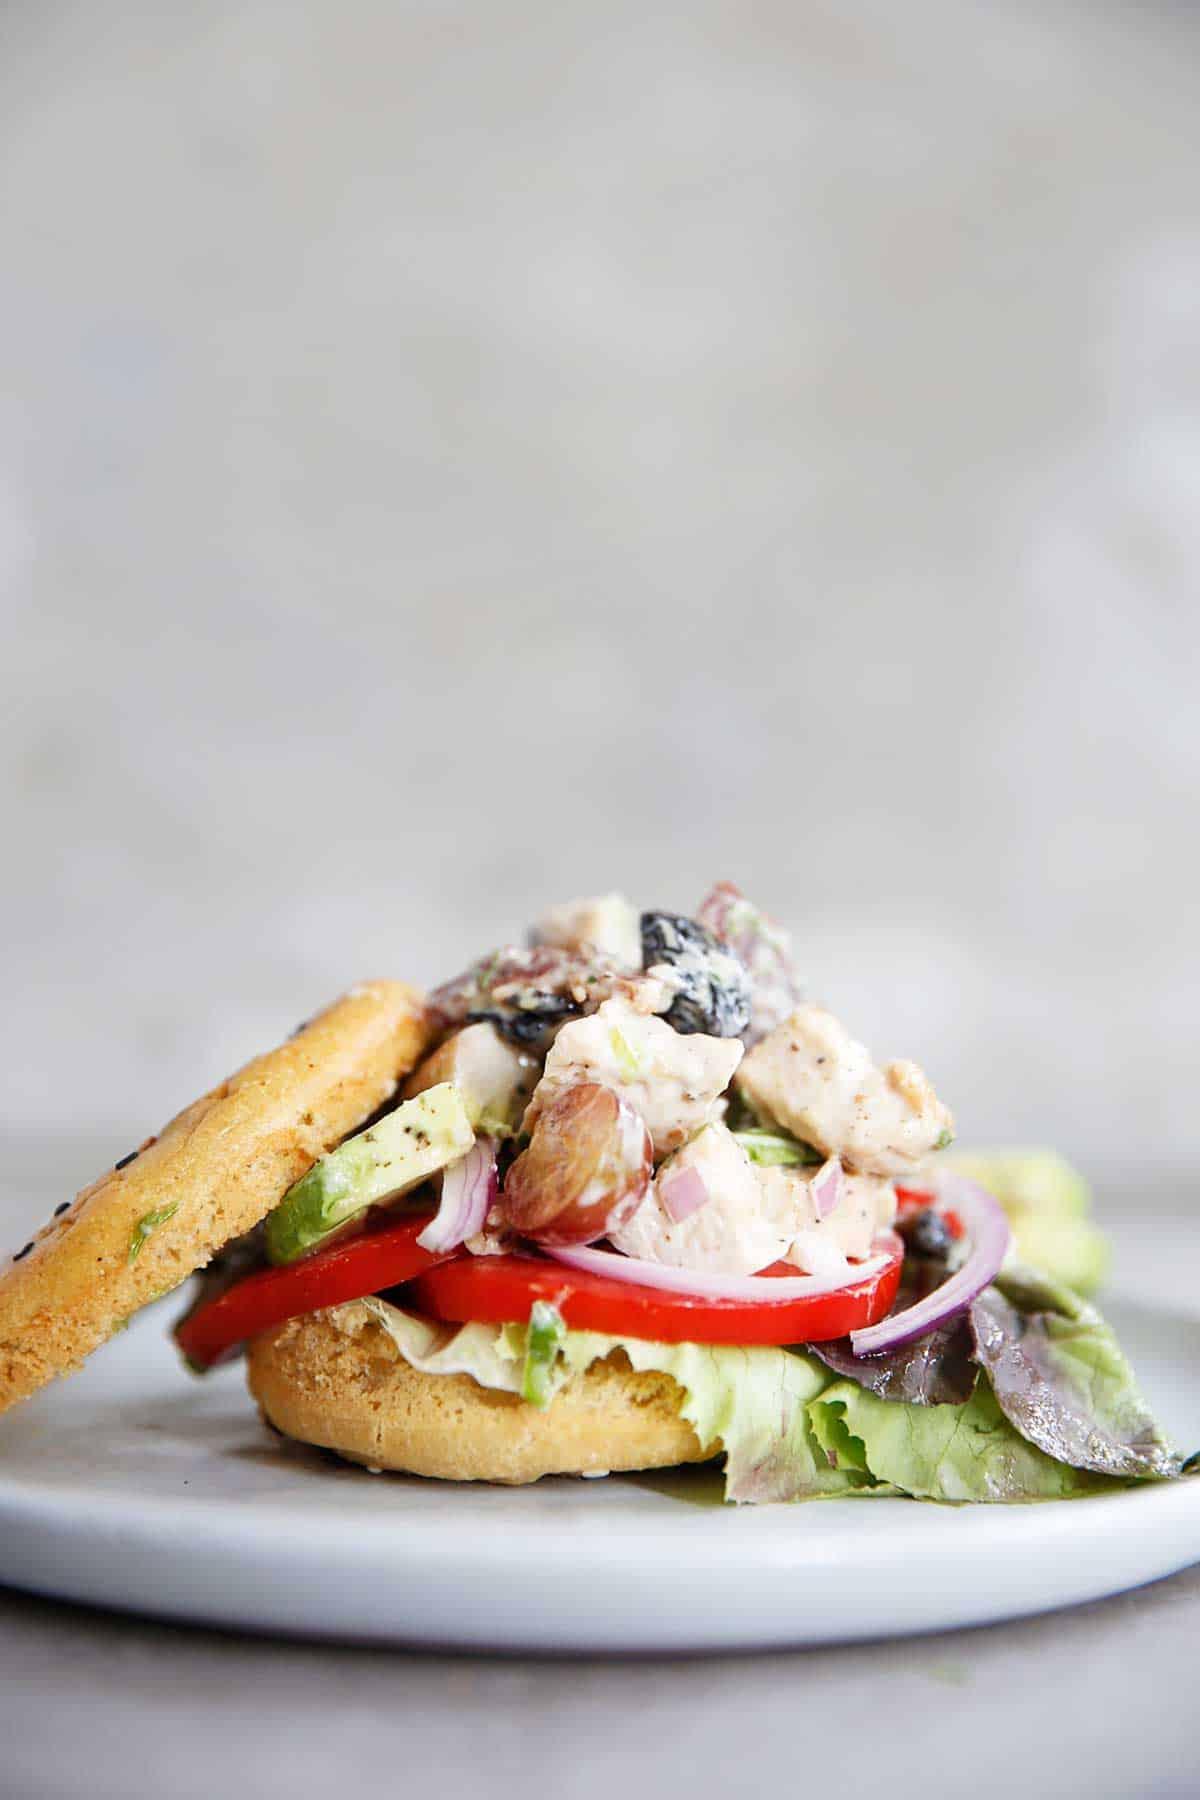 Loaded Chicken Salad Sandwich | Lexi's Clean Kitchen